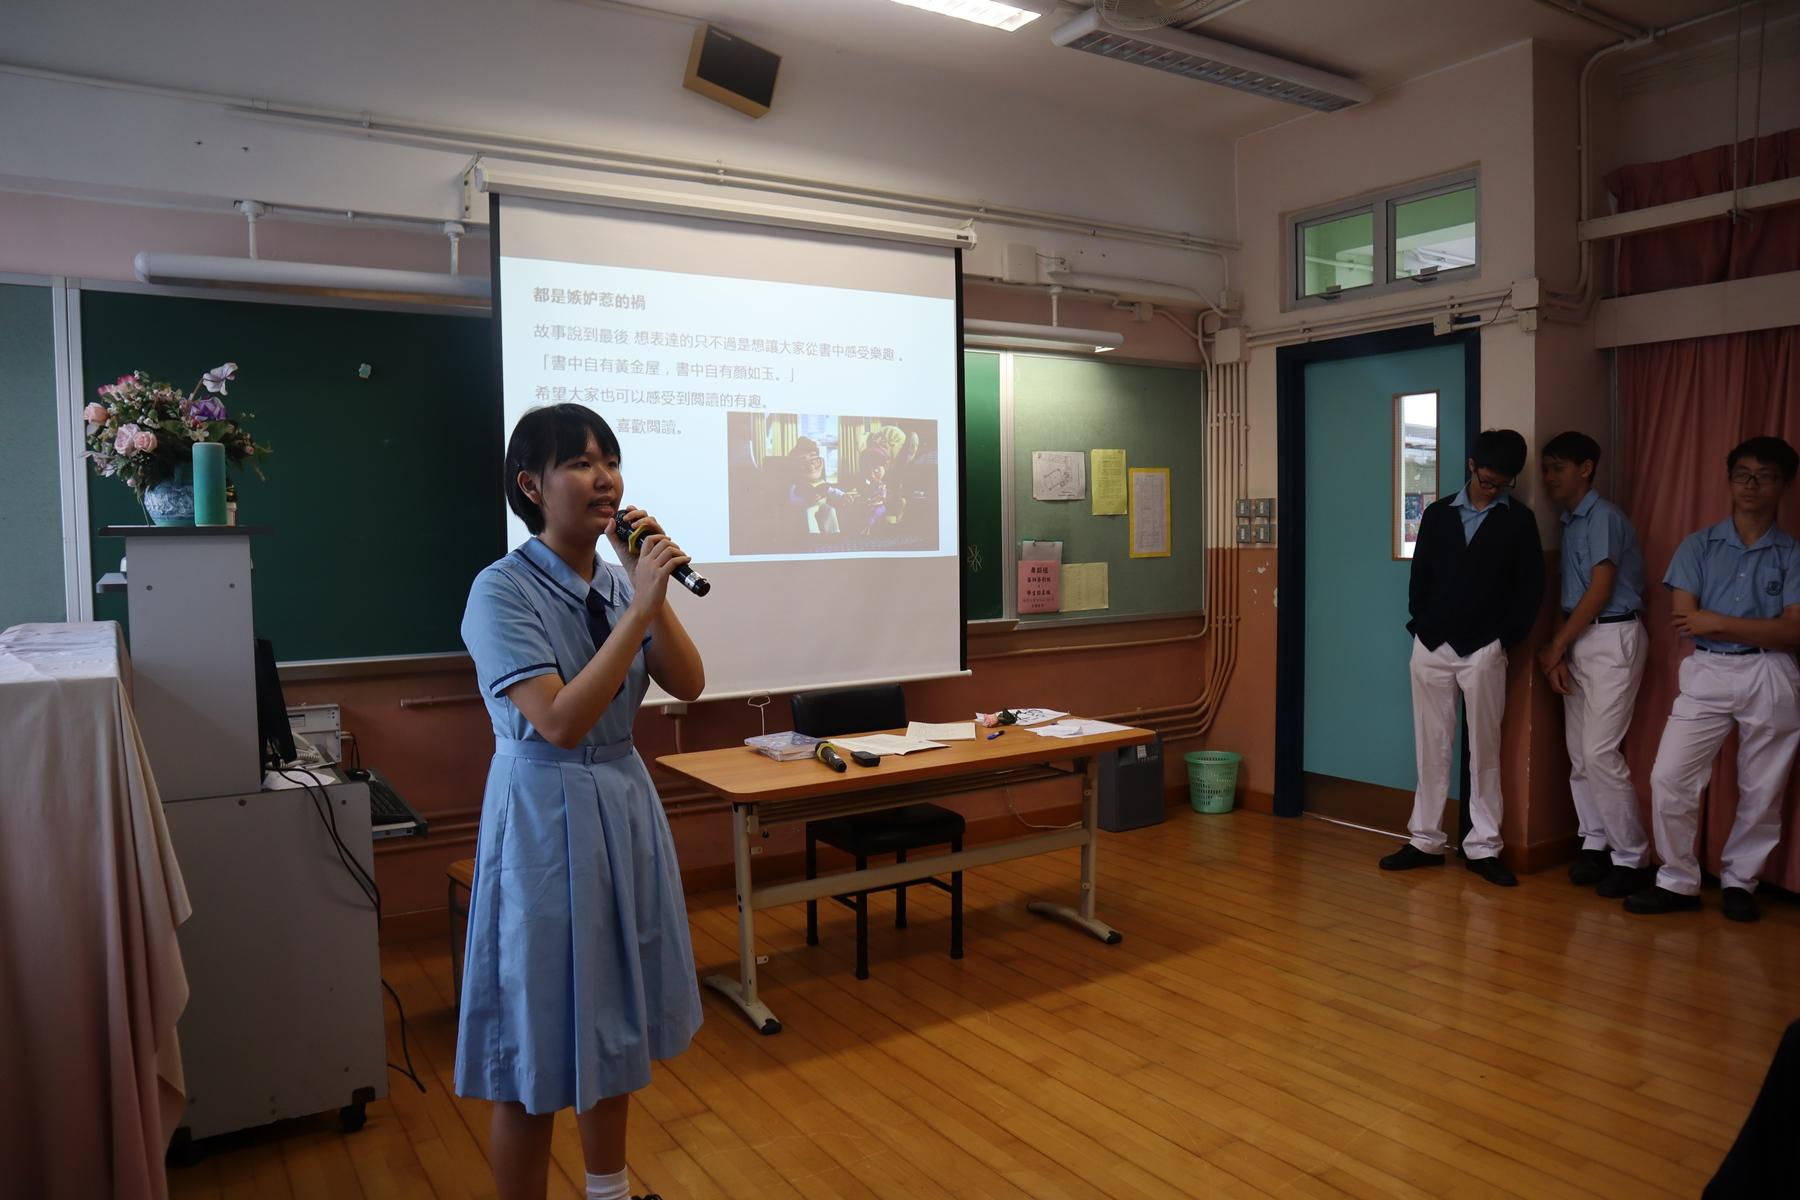 http://npc.edu.hk/sites/default/files/img_9183.jpg